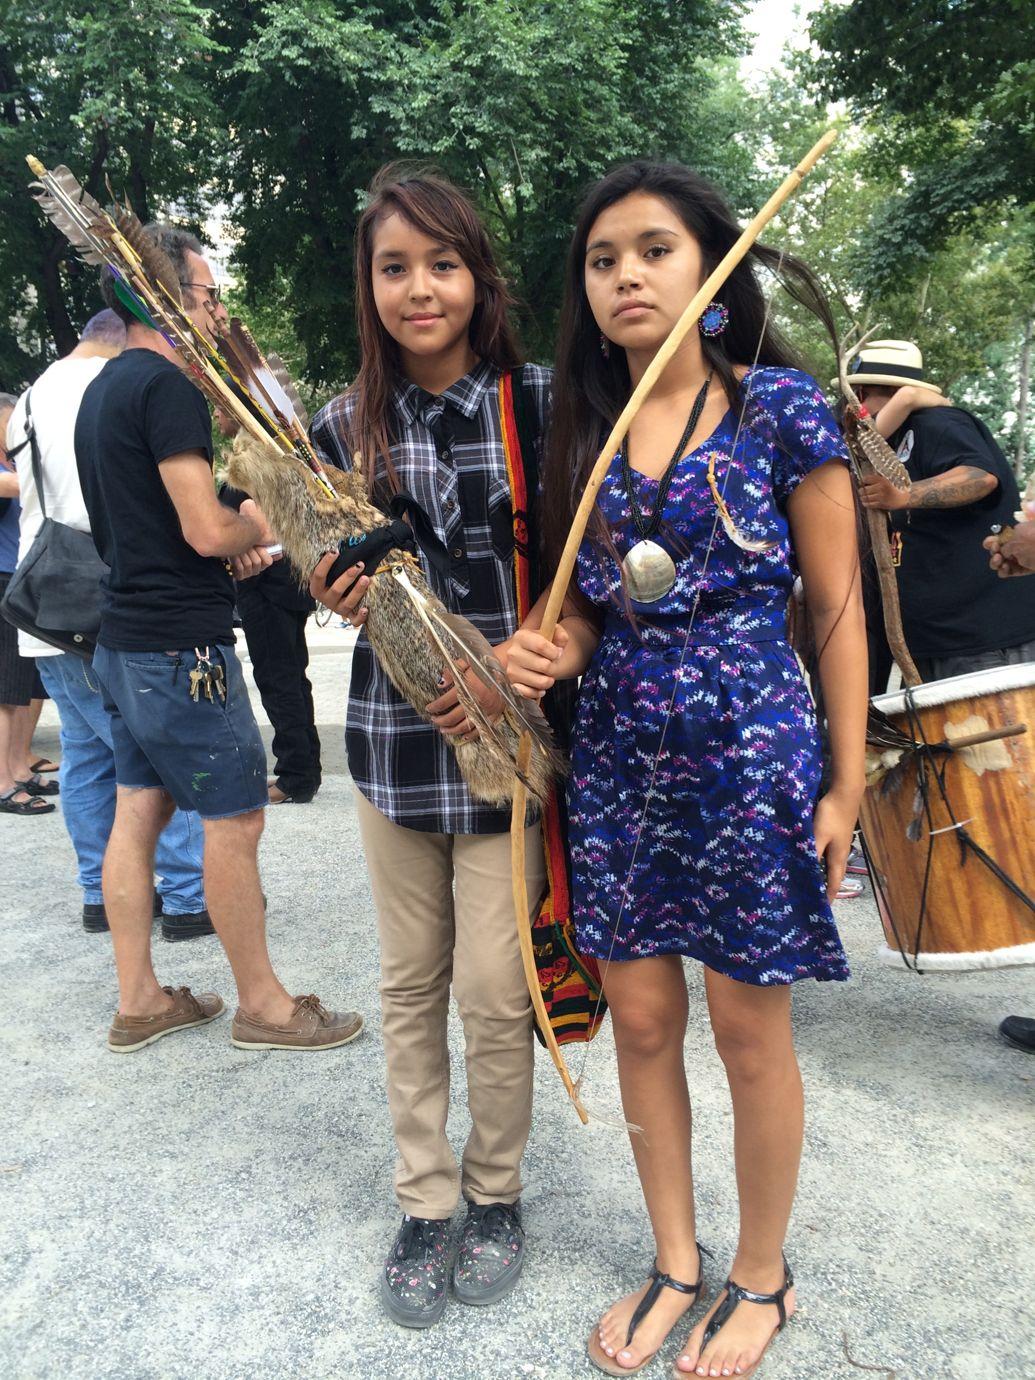 TRANSCEND MEDIA SERVICE » Meet the Apache Activists ...